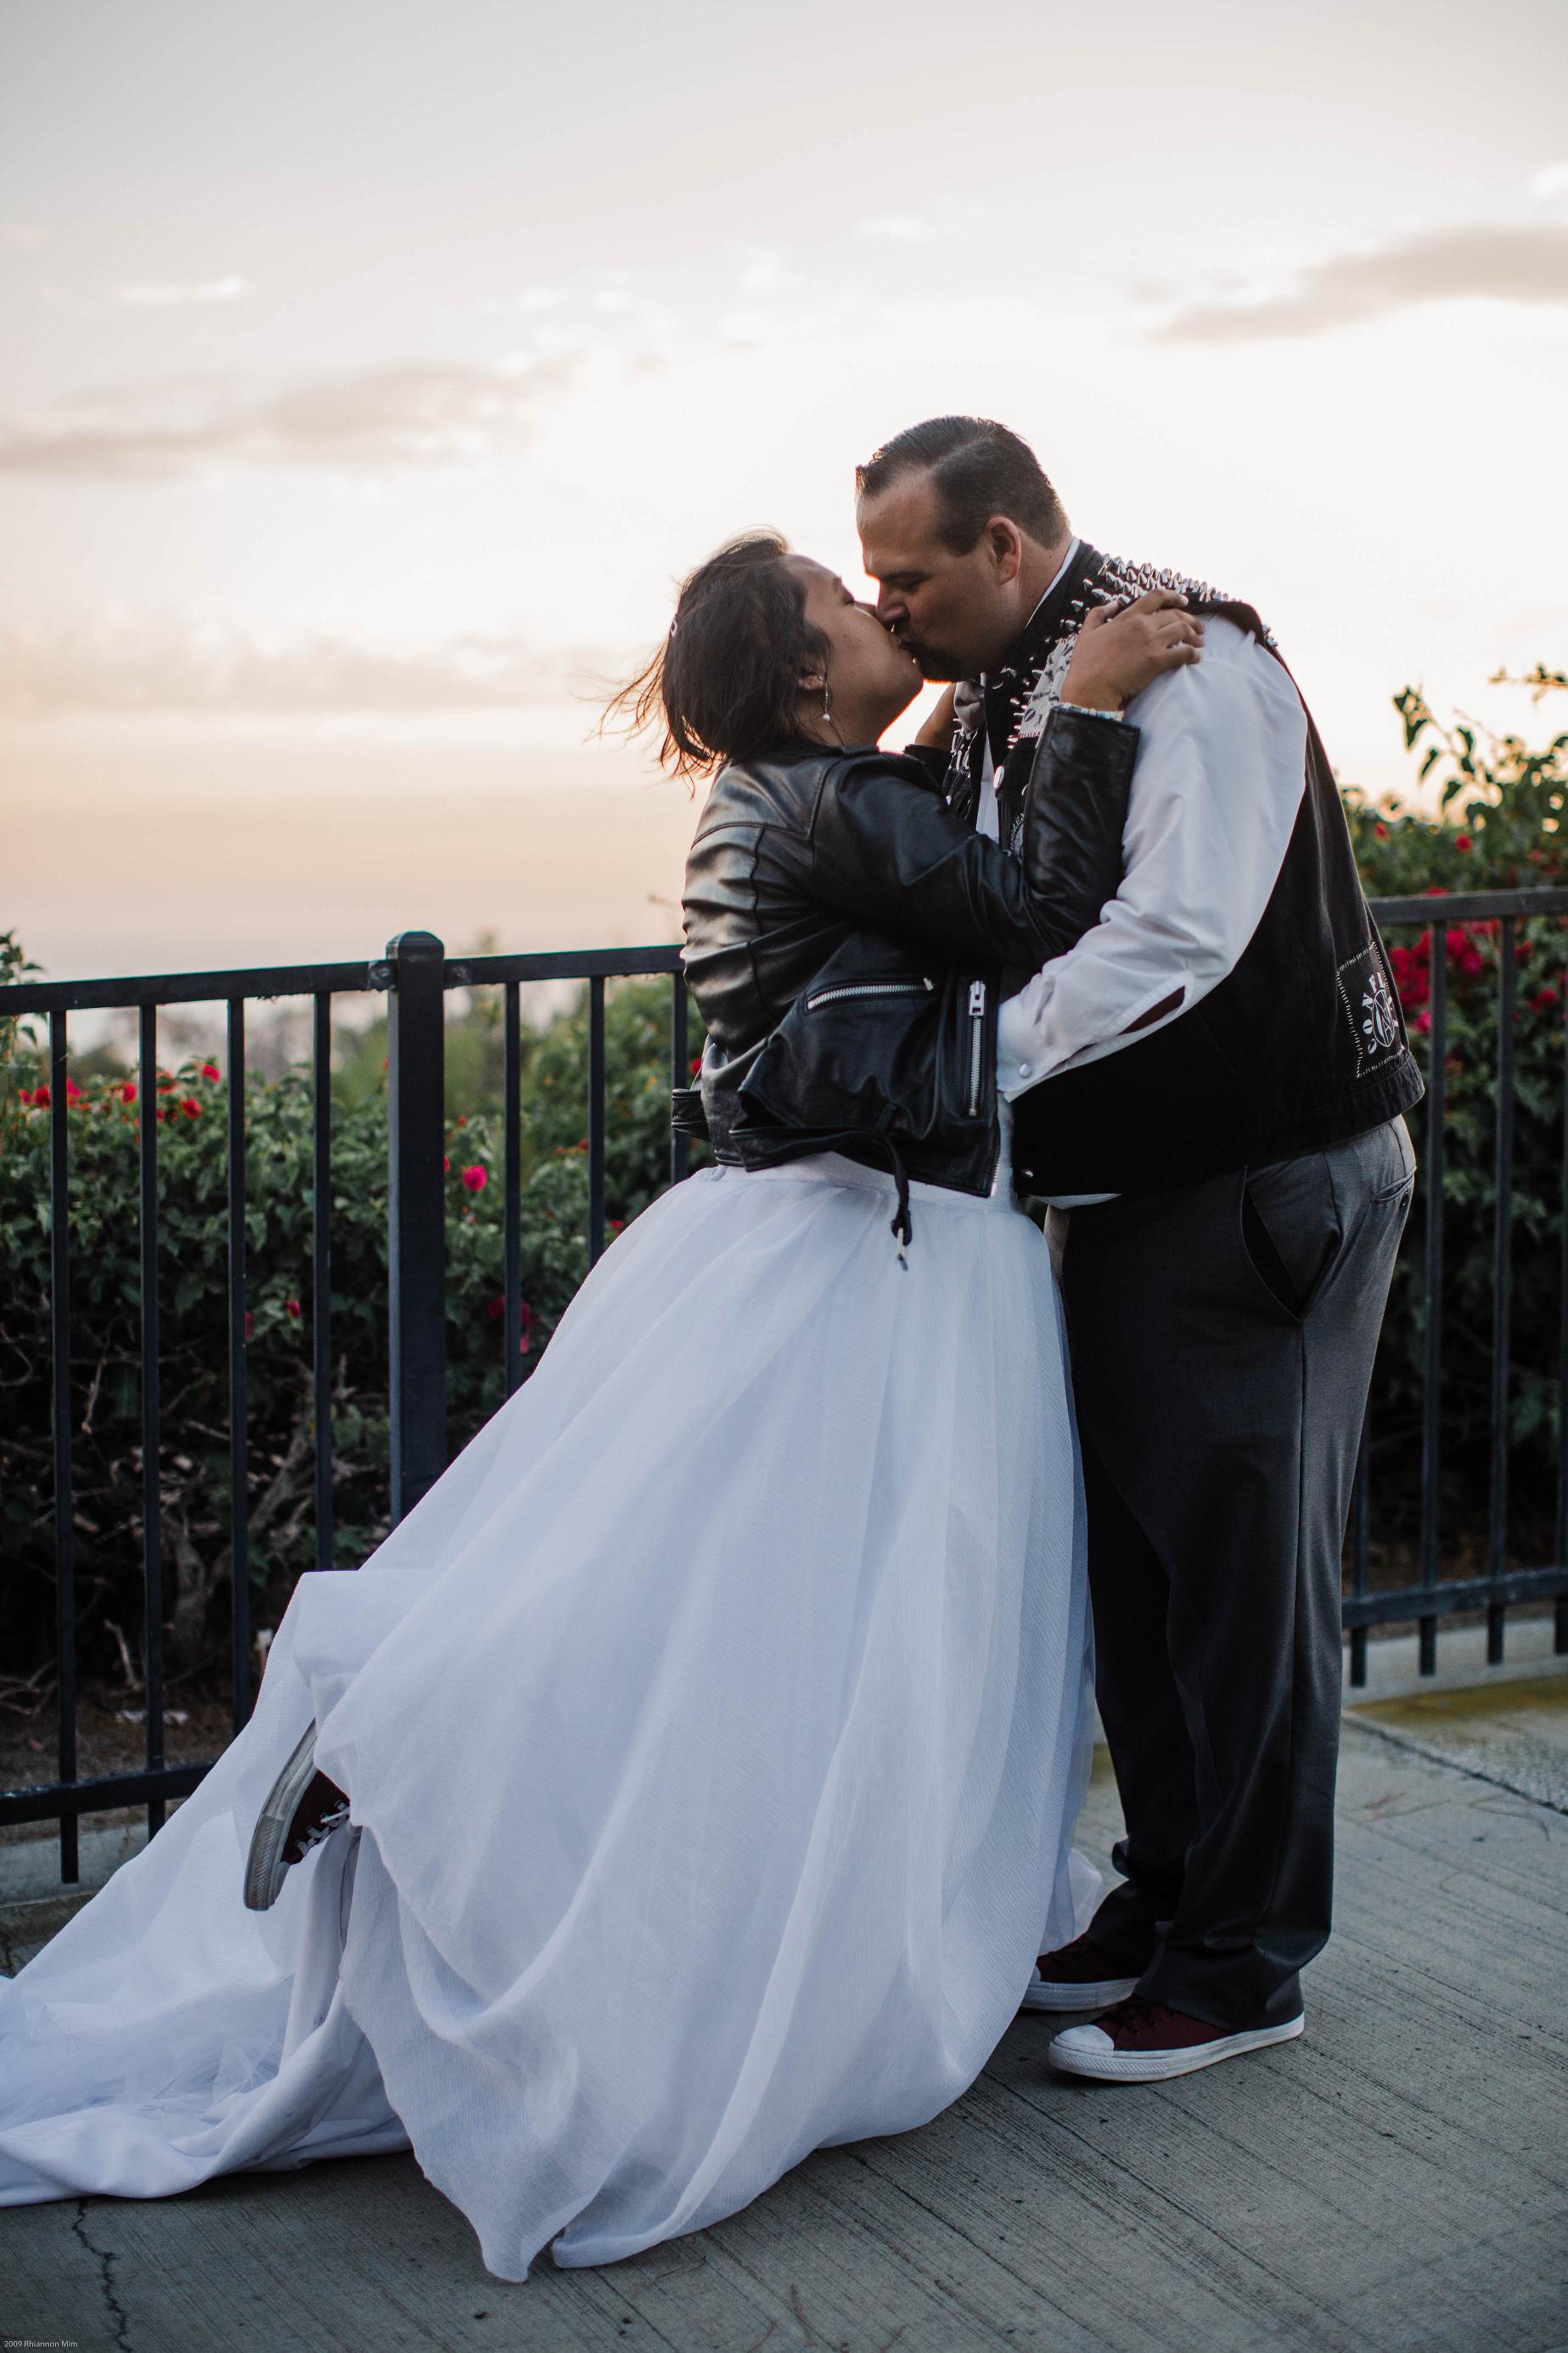 20170909_Wedding_1322